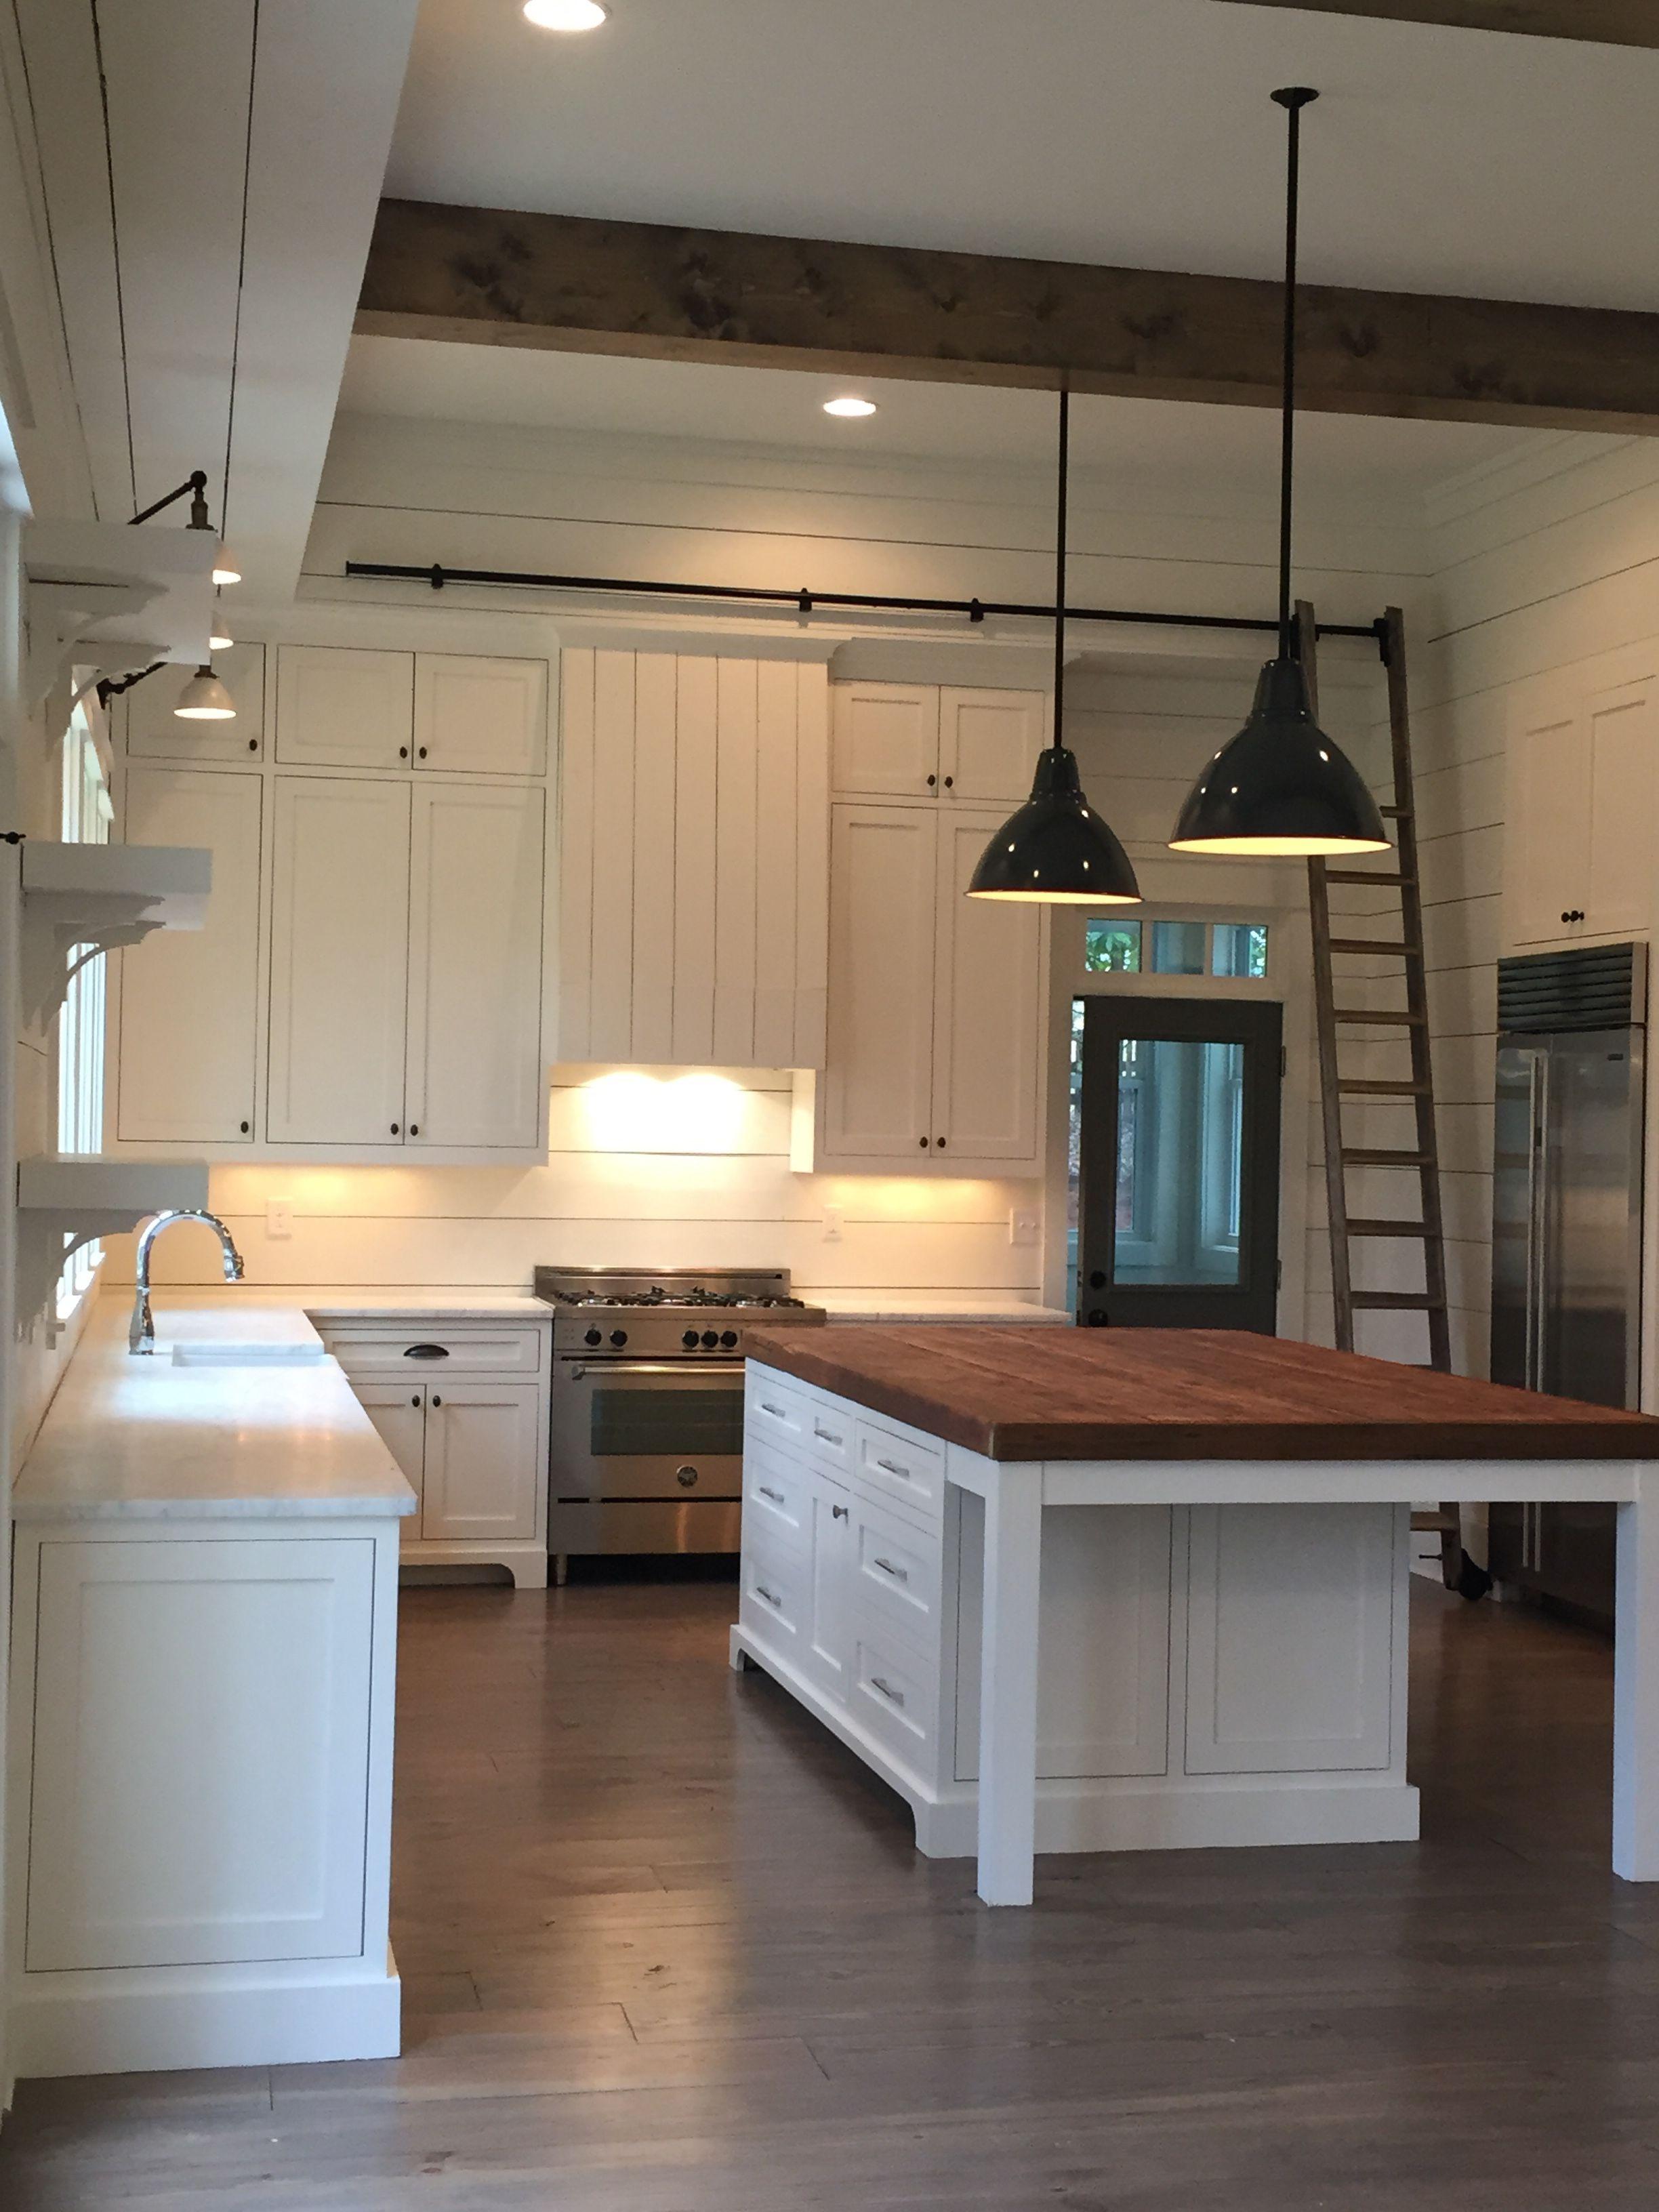 Top 29 Diy Ideas Adding Rustic Farmhouse Feels To Kitchen: Kitchen Island Design, Kitchen Island With Seating